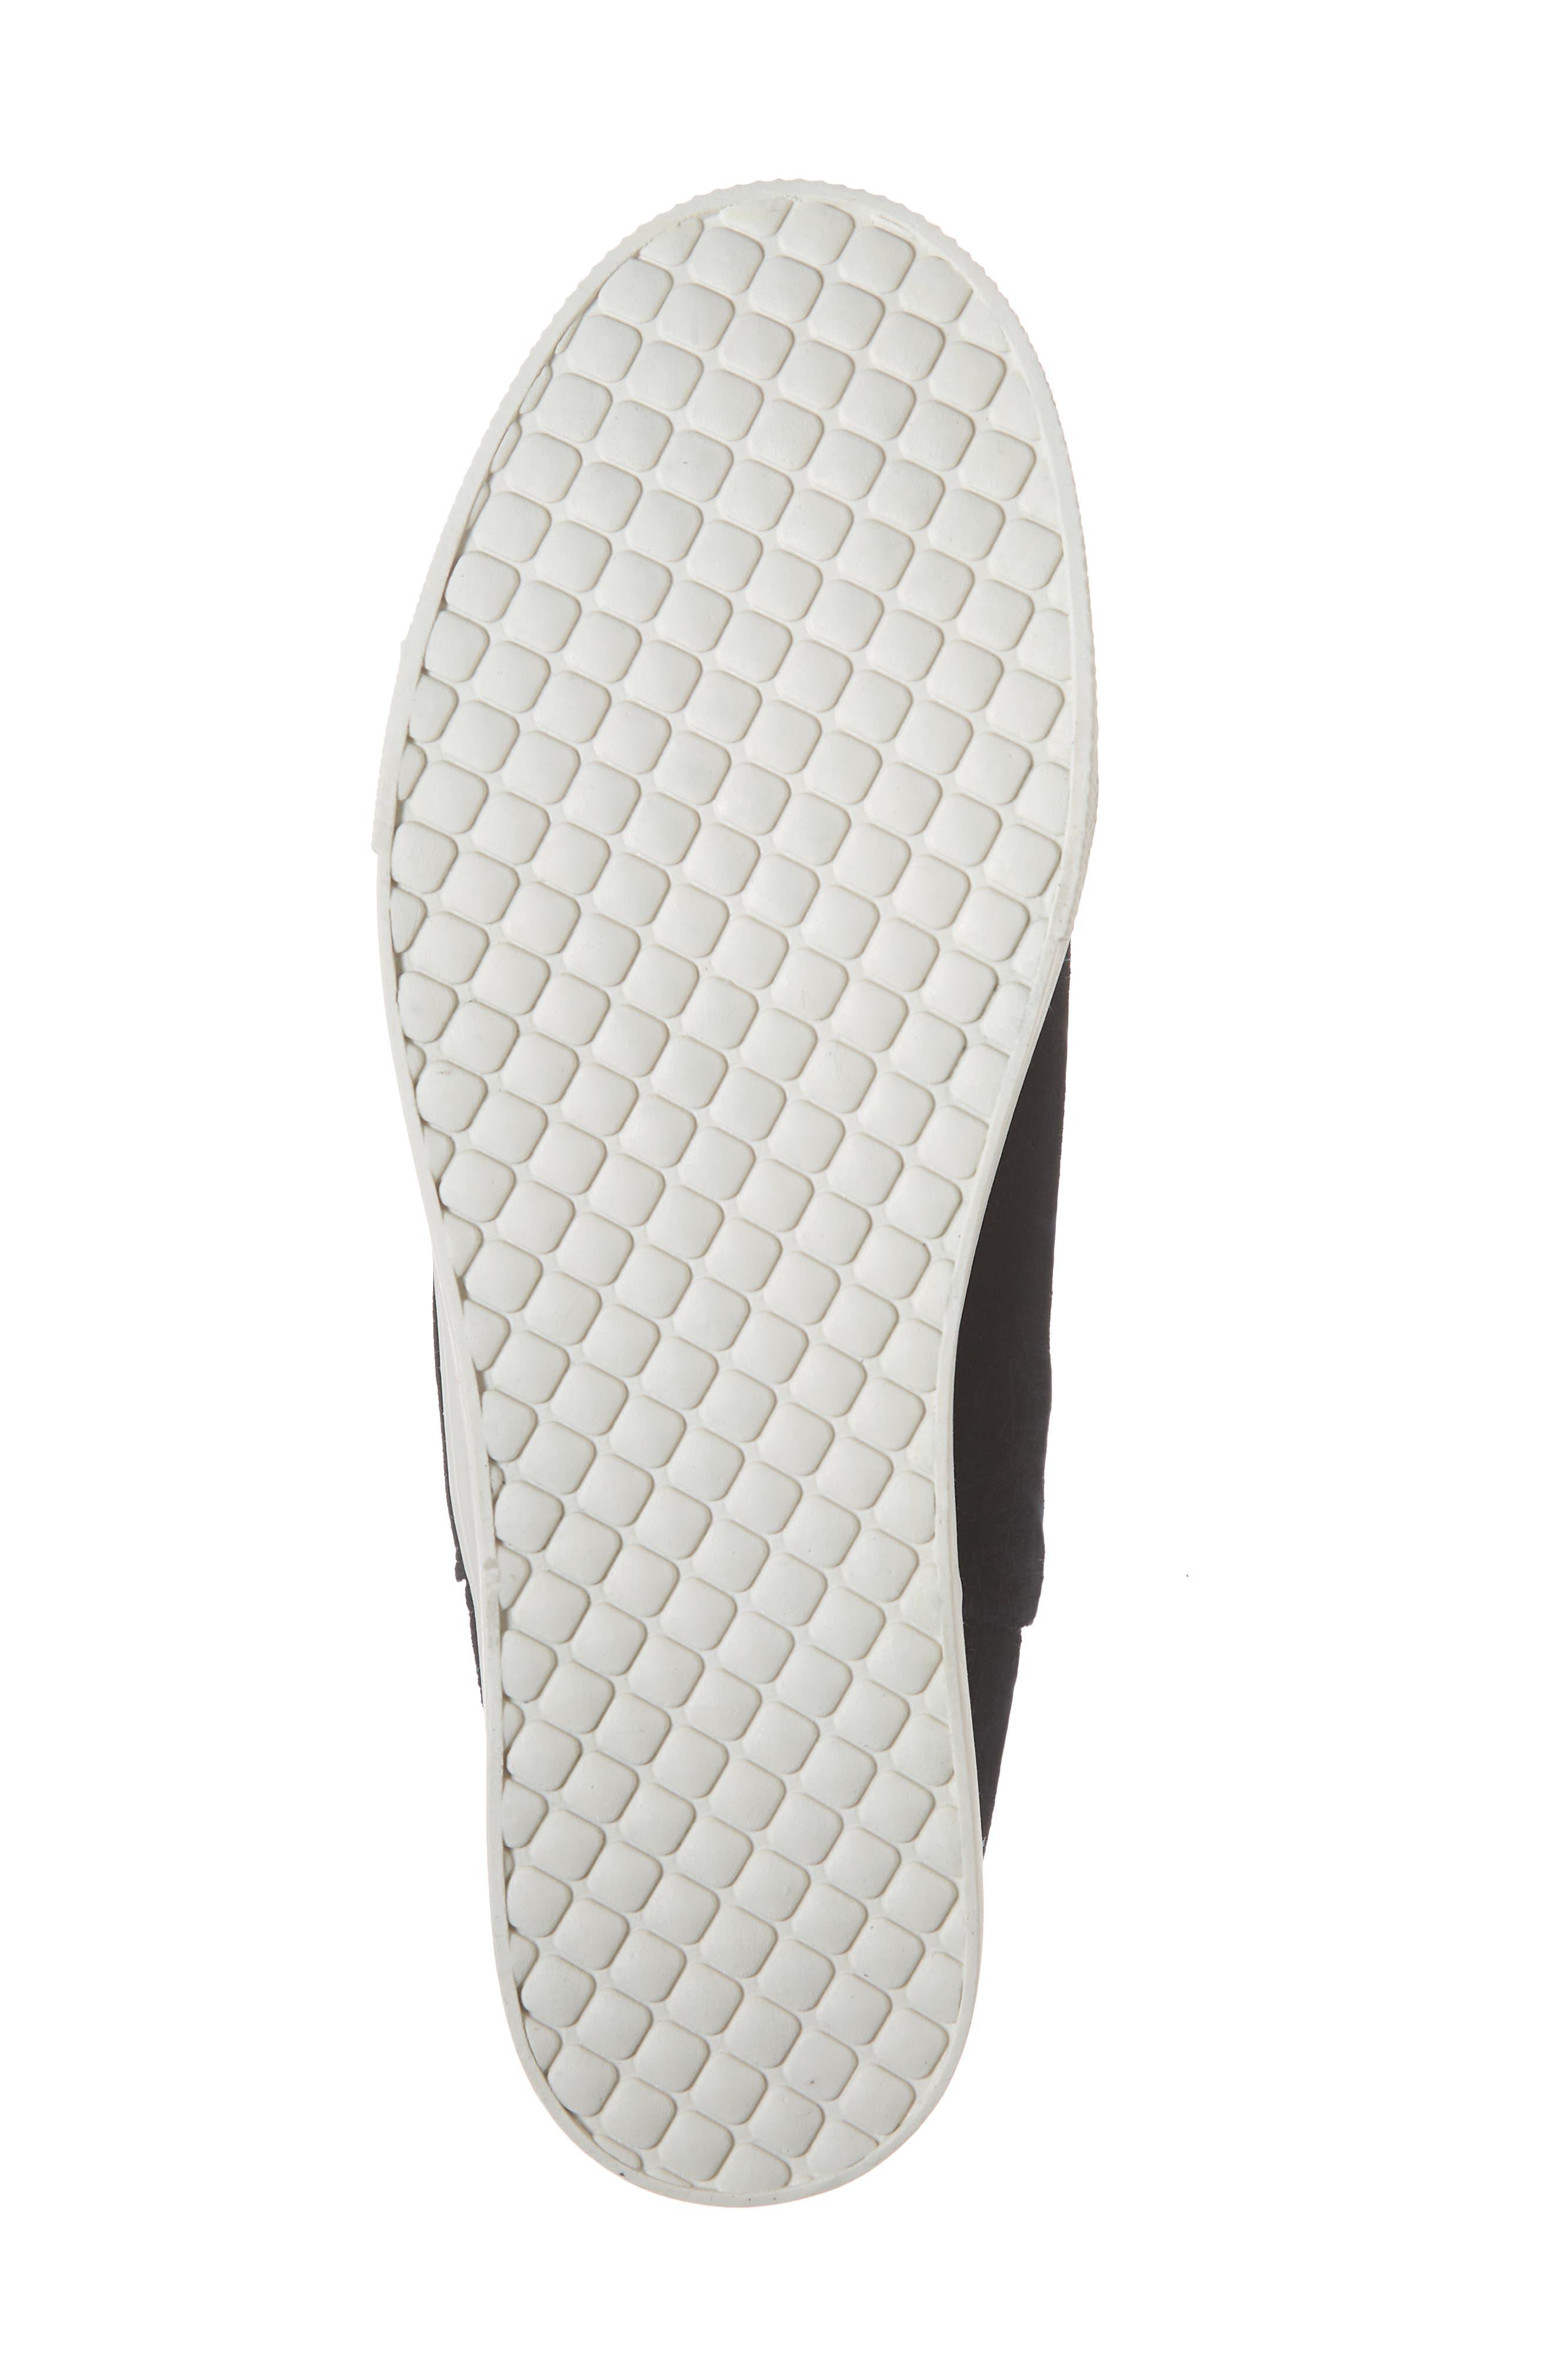 Wrangle Sneaker,                             Alternate thumbnail 6, color,                             BLACK SUEDE